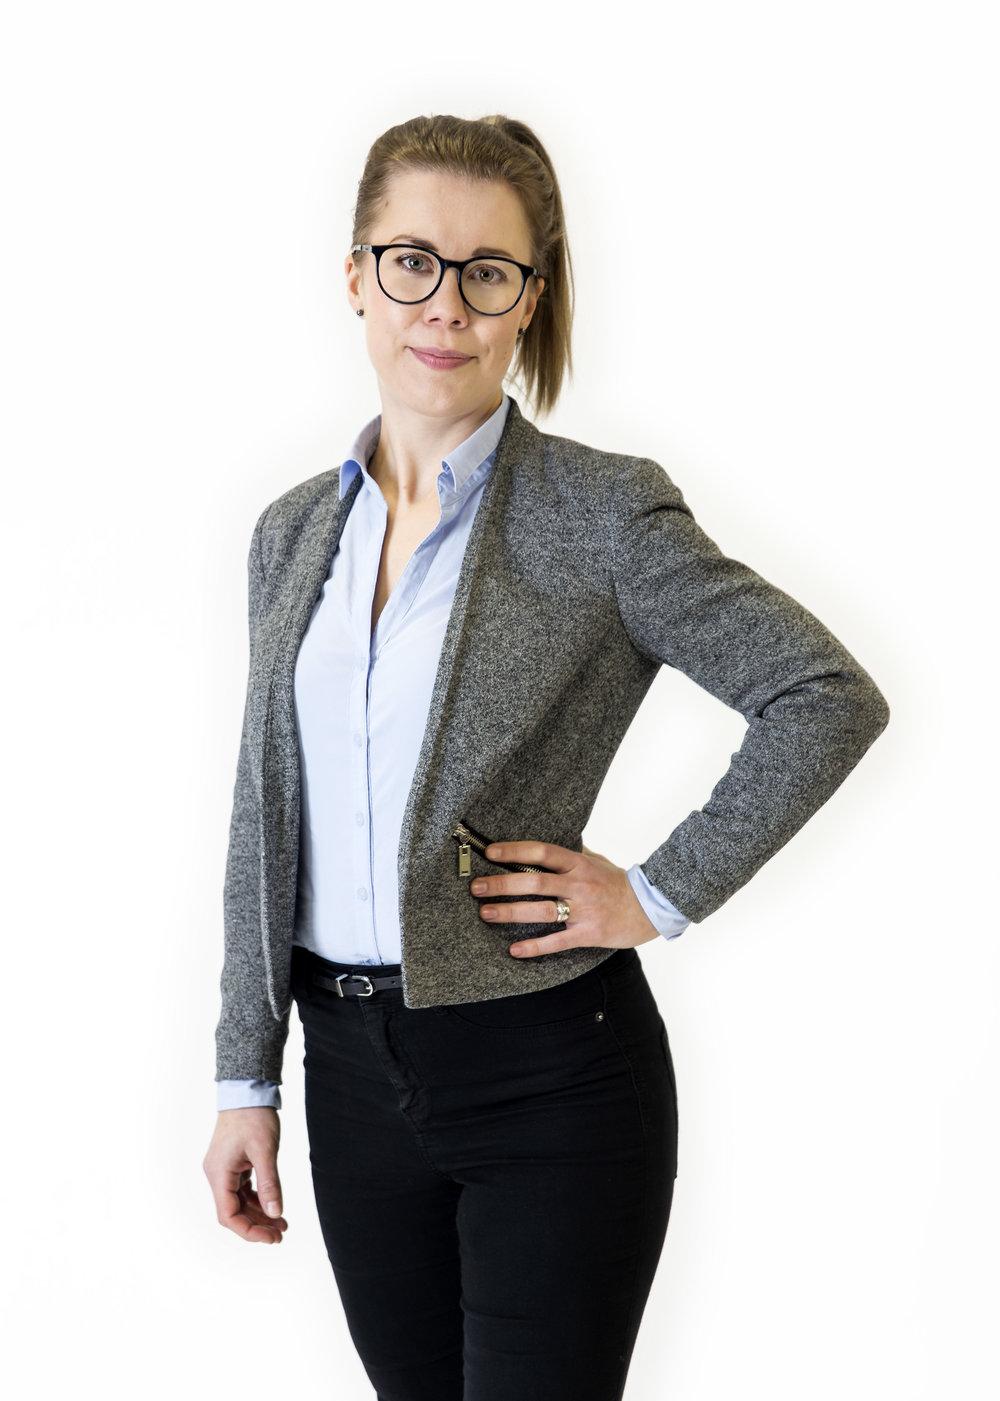 Business Lady   Business image for Anniina Oksman.